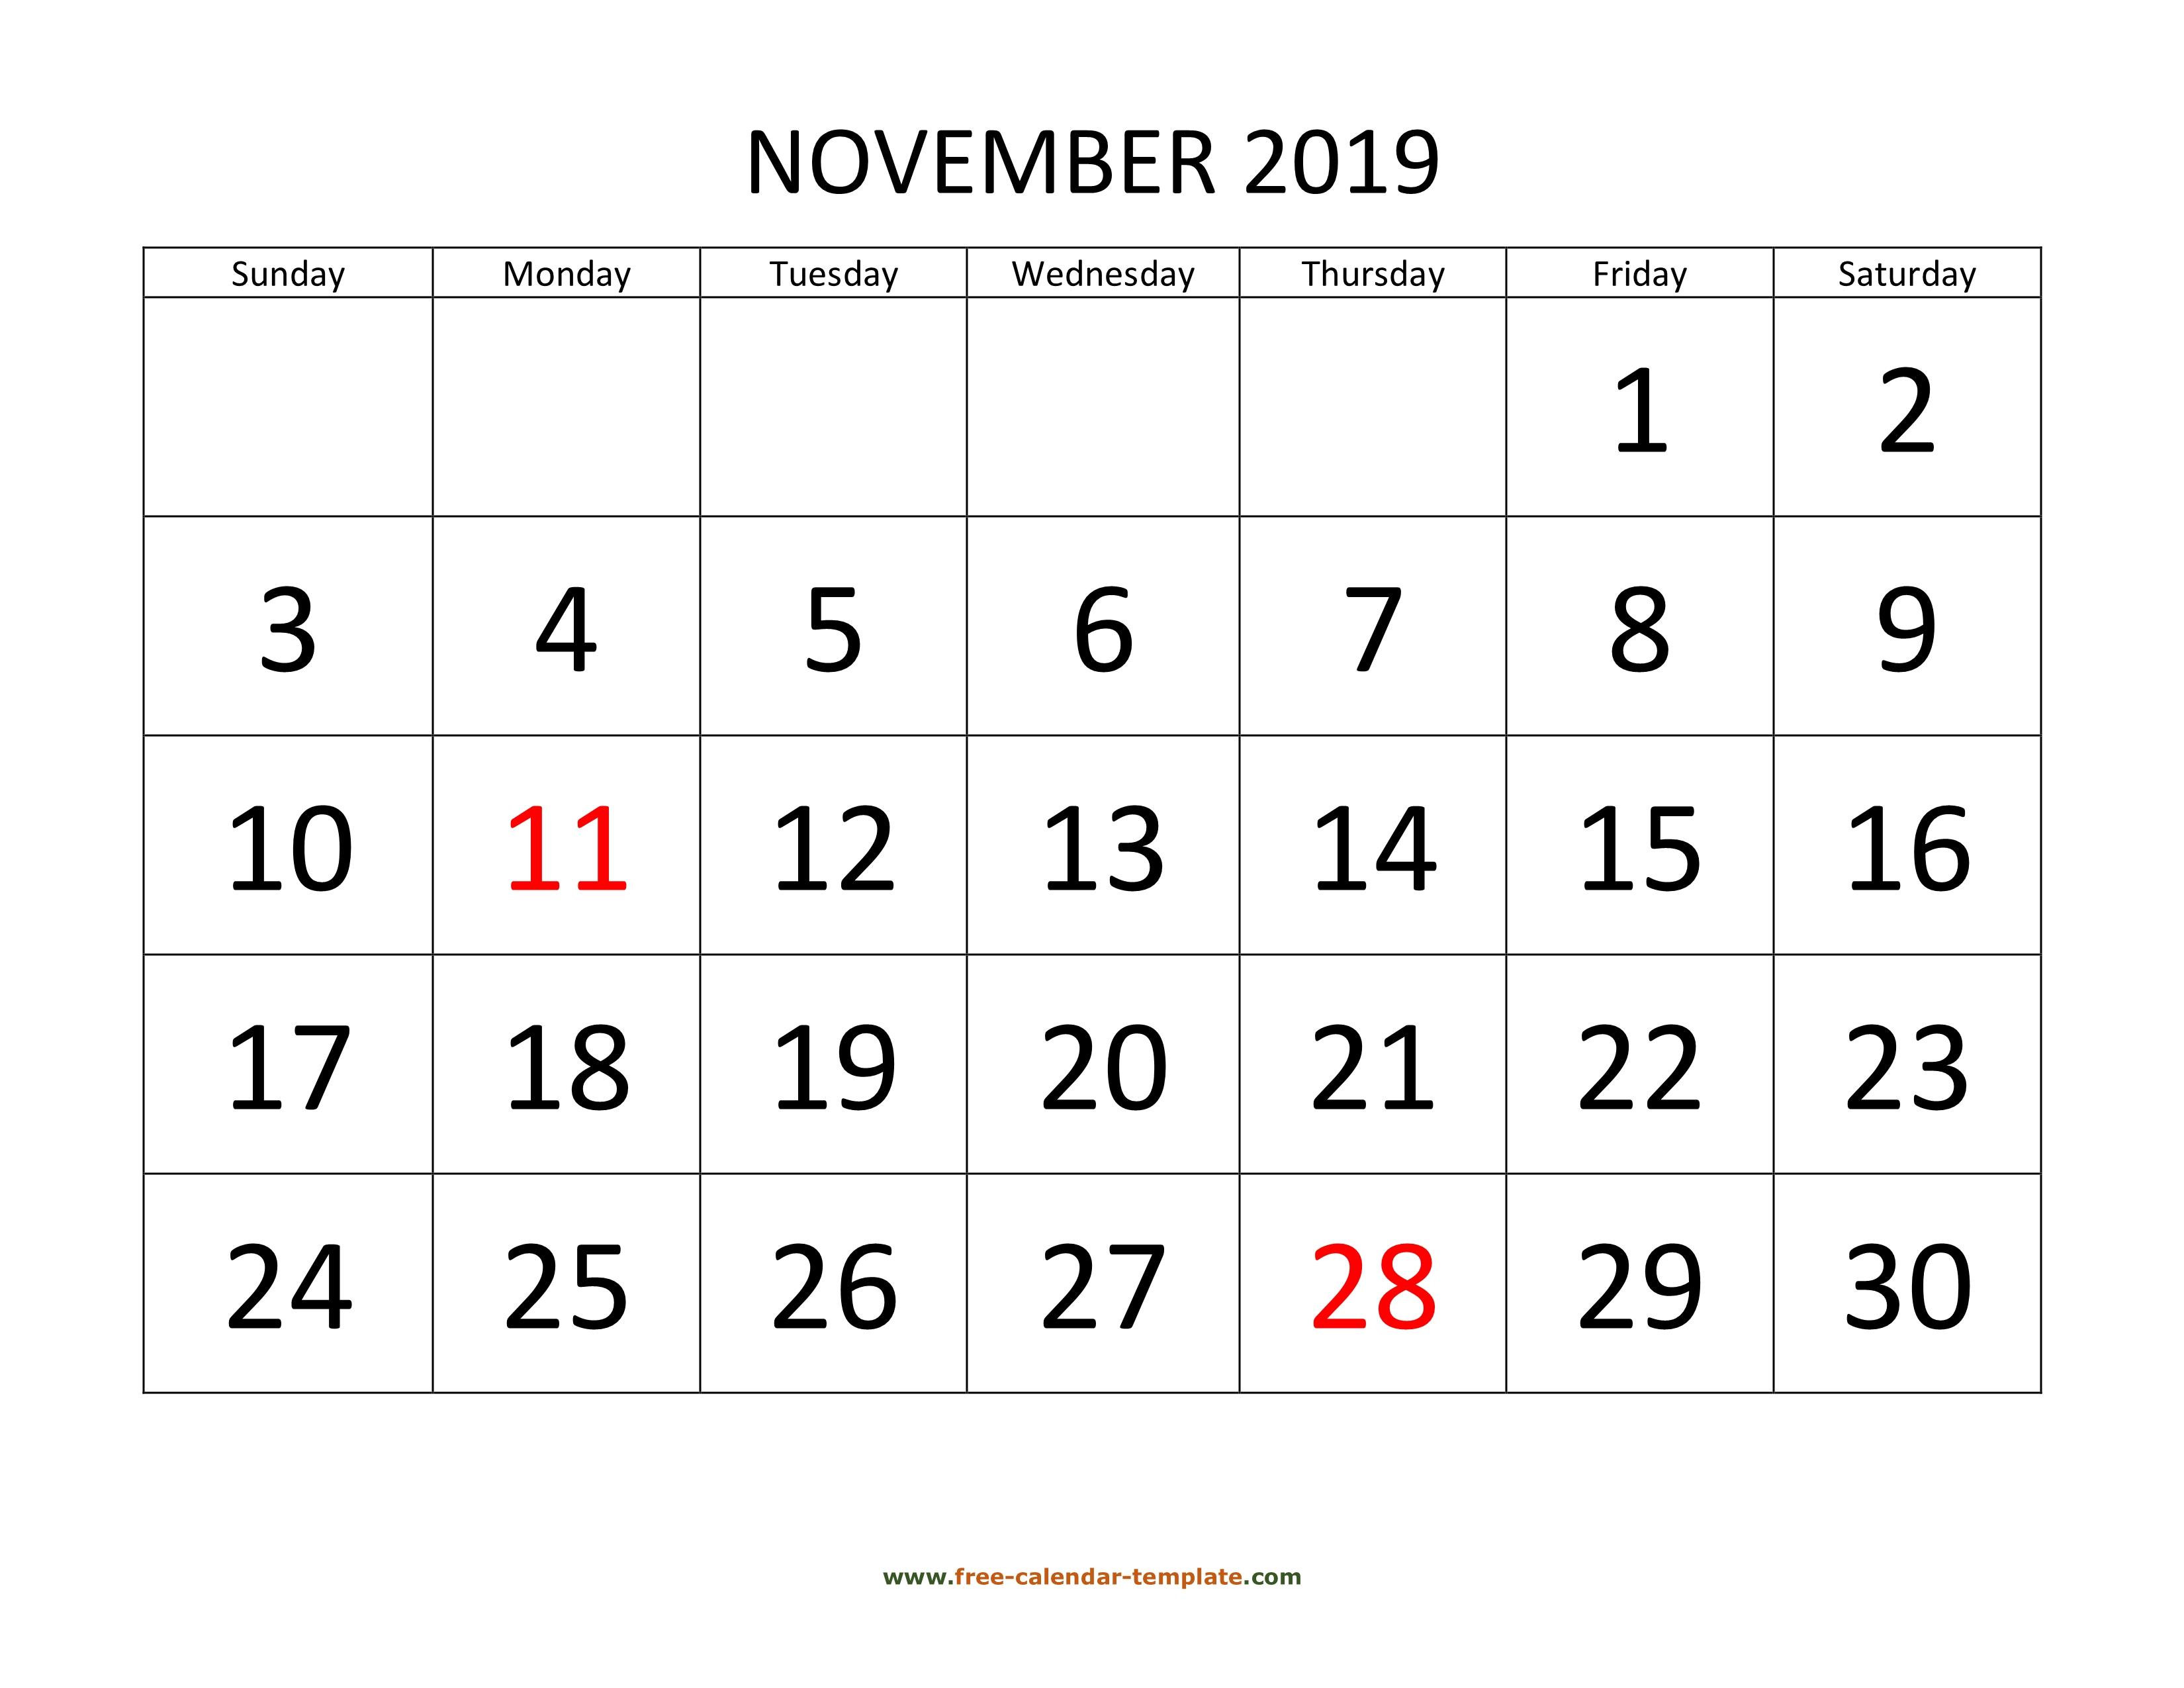 November 2019 Free Calendar Tempplate | Free-Calendar